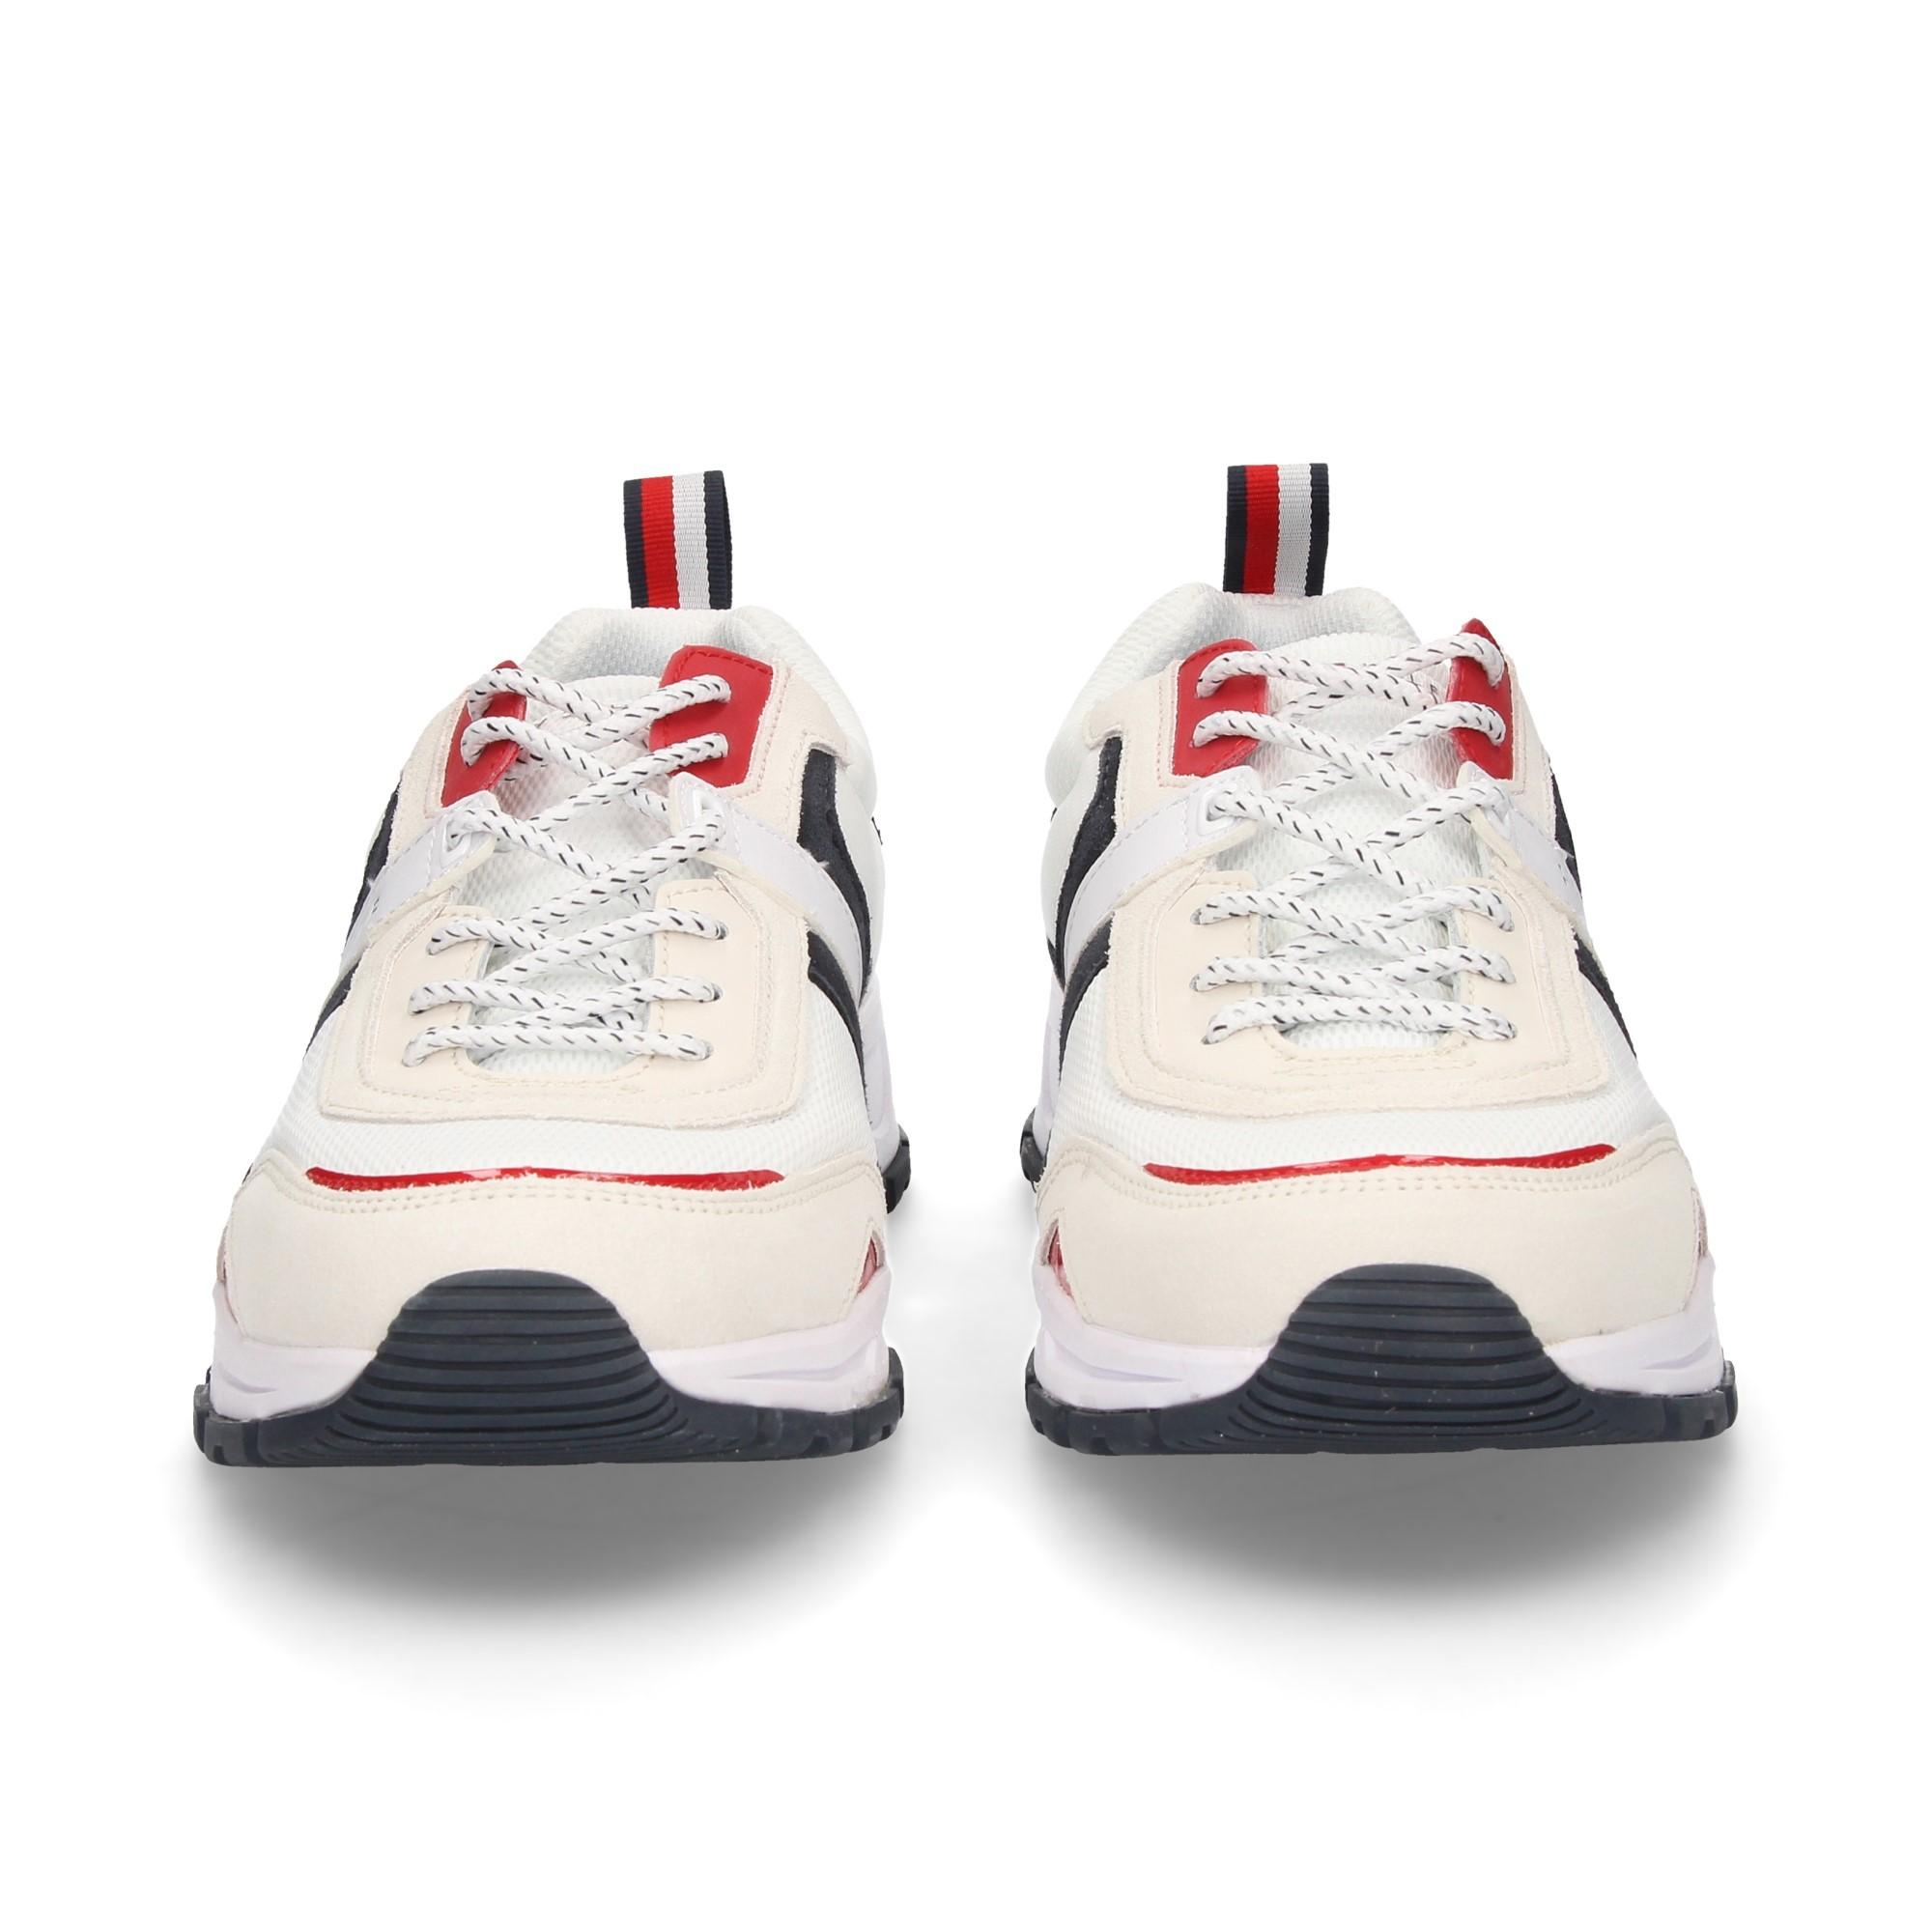 deportivo-textil-rojo-azul-blanco